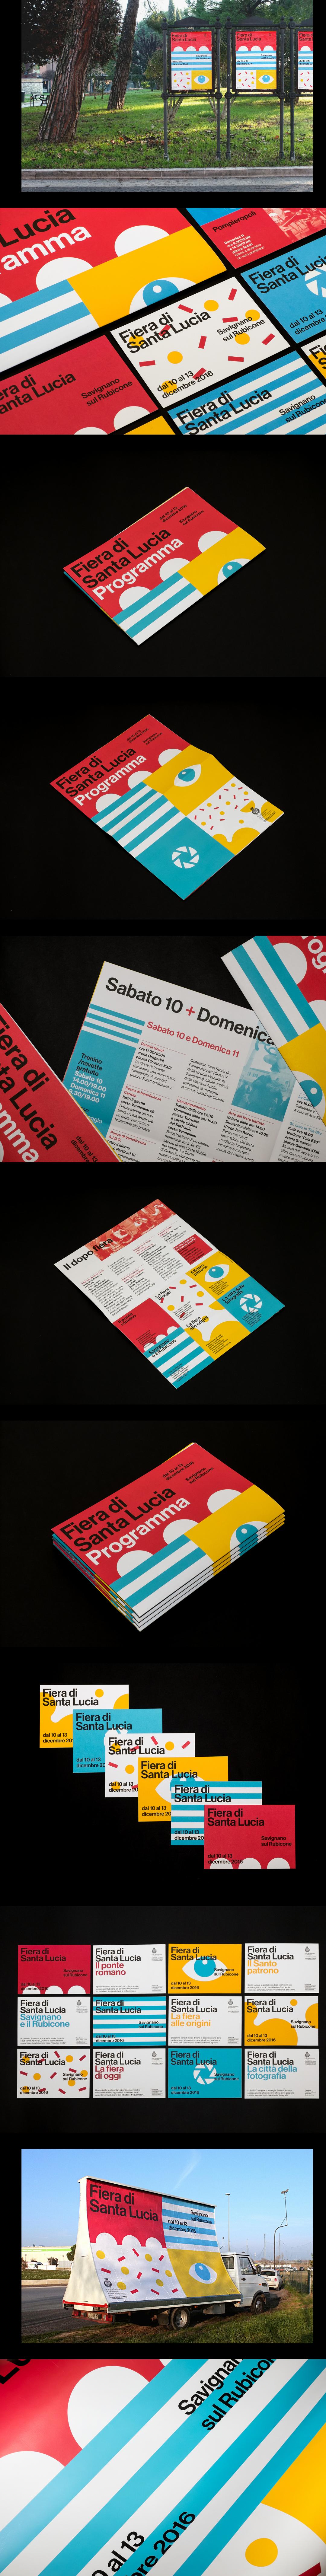 Graphic Design,Advertising,Branding